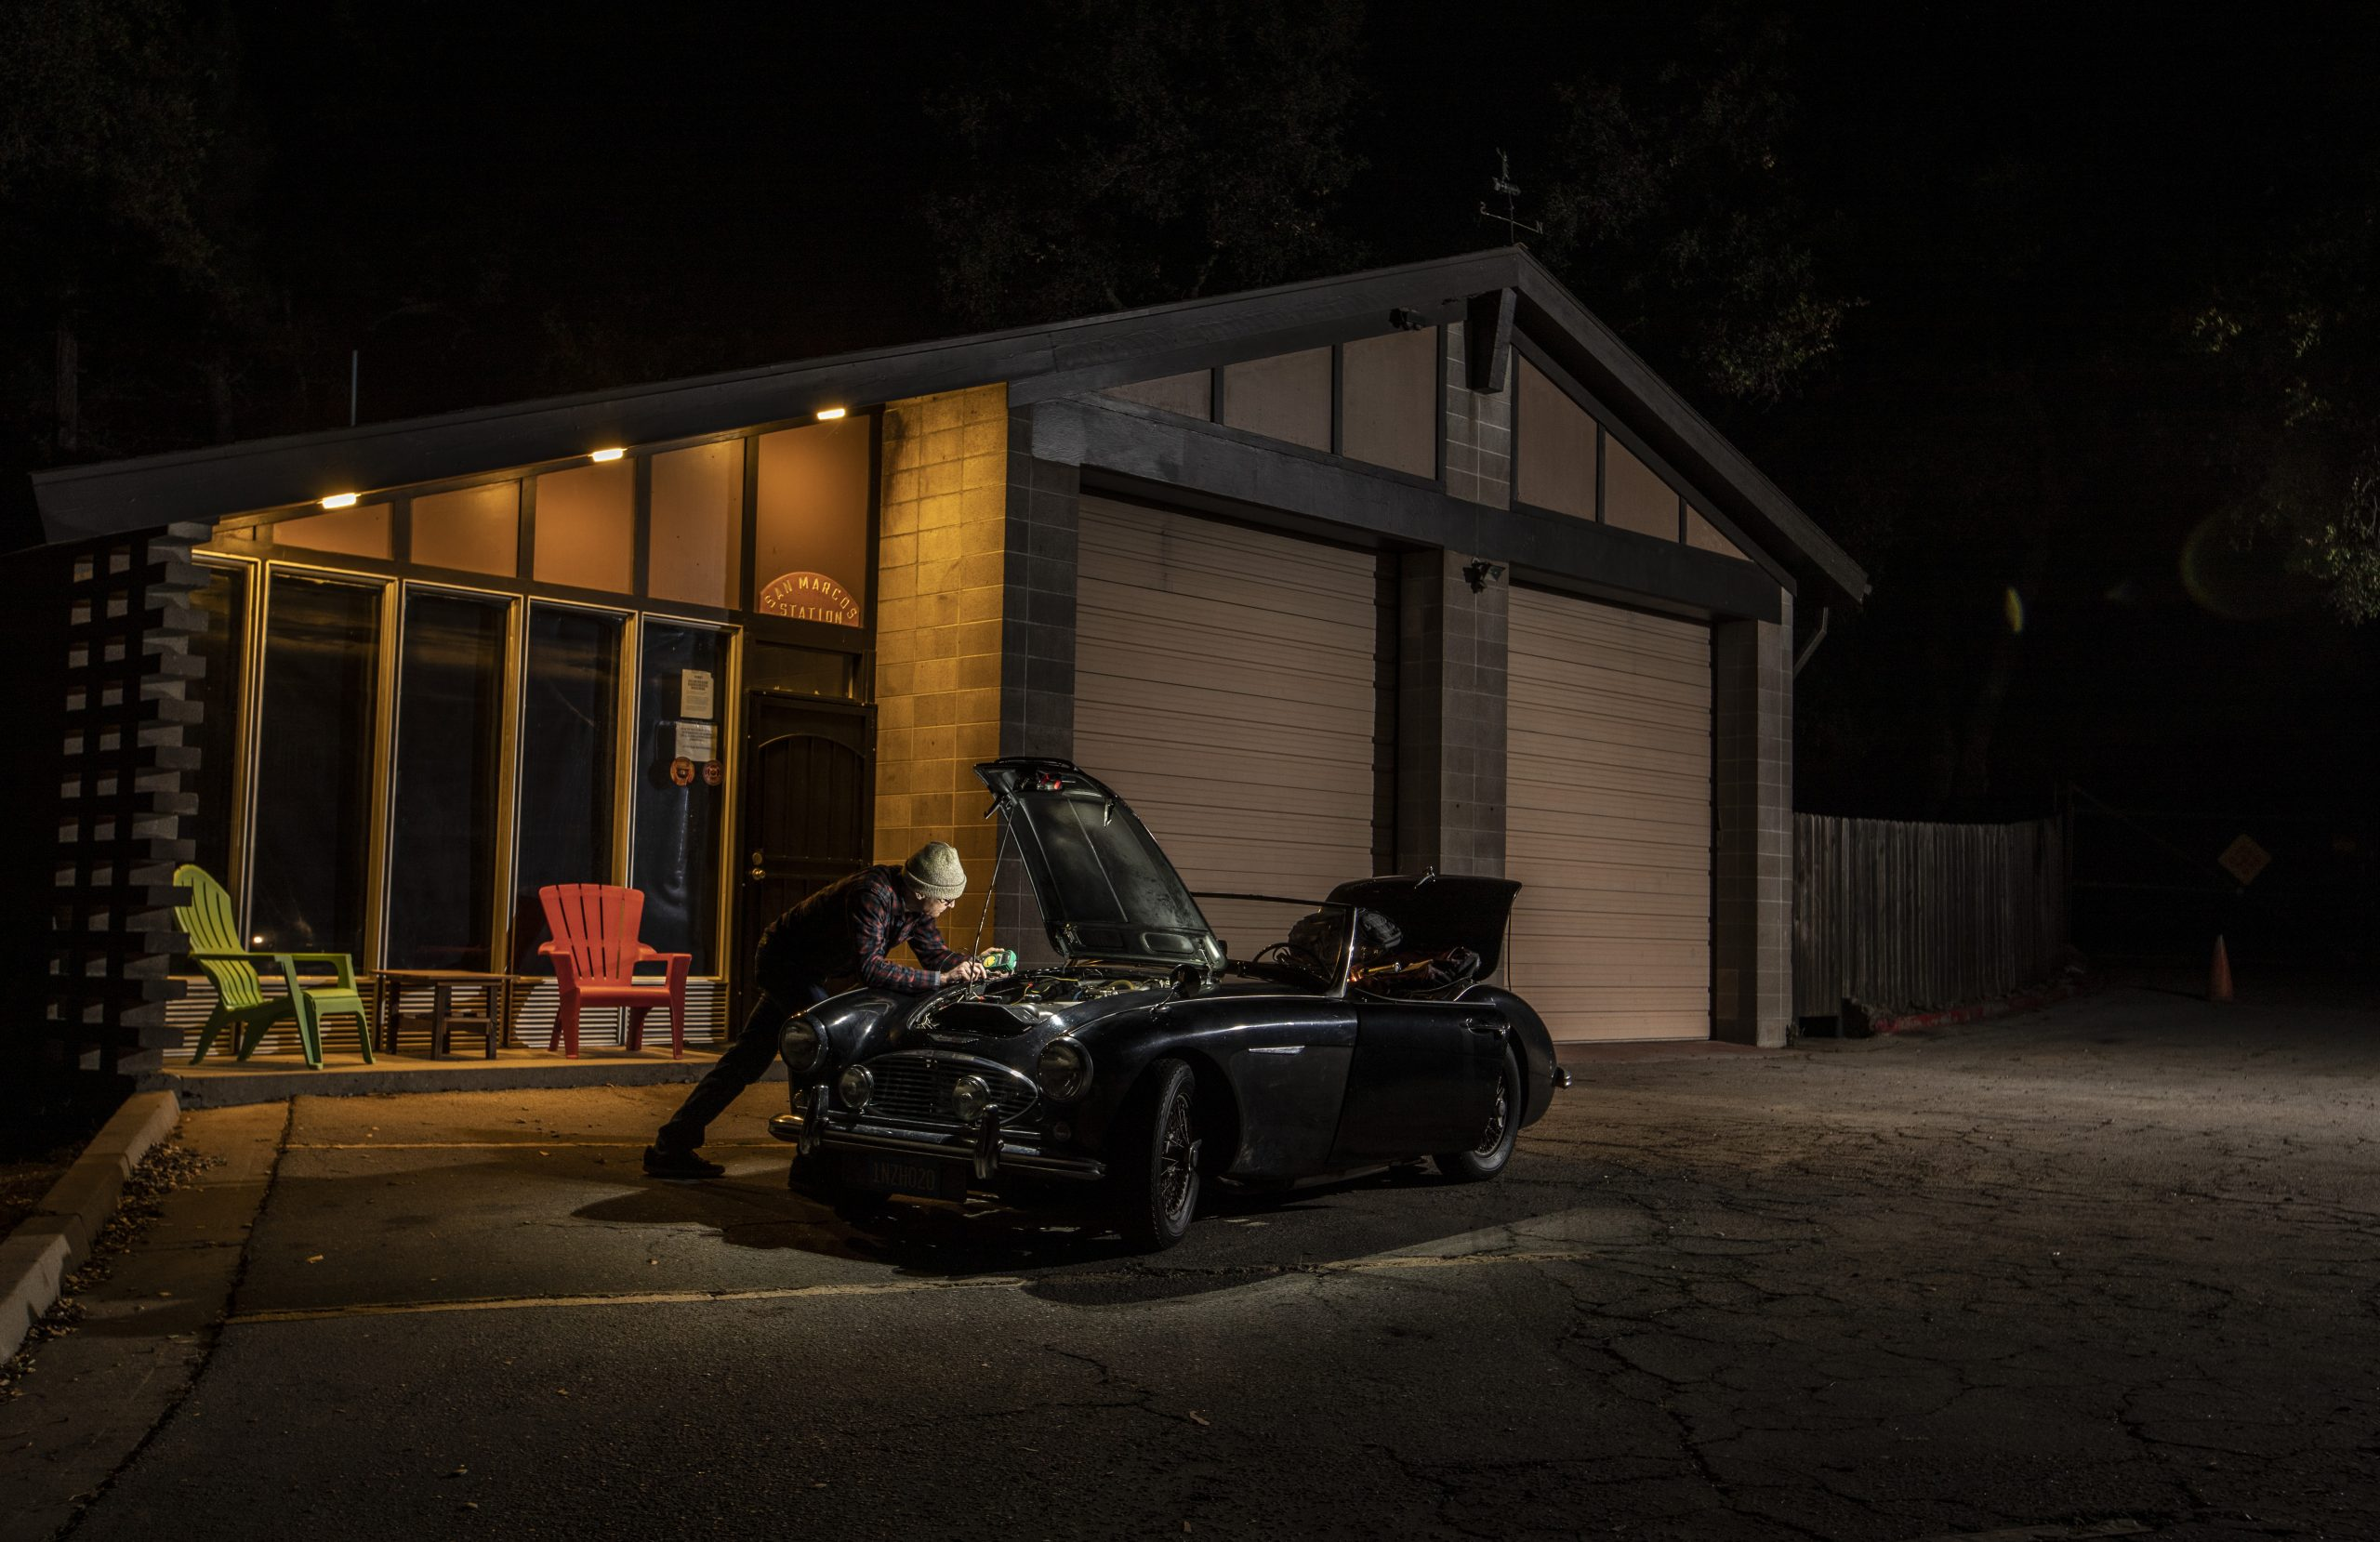 Austin-Healey night repair